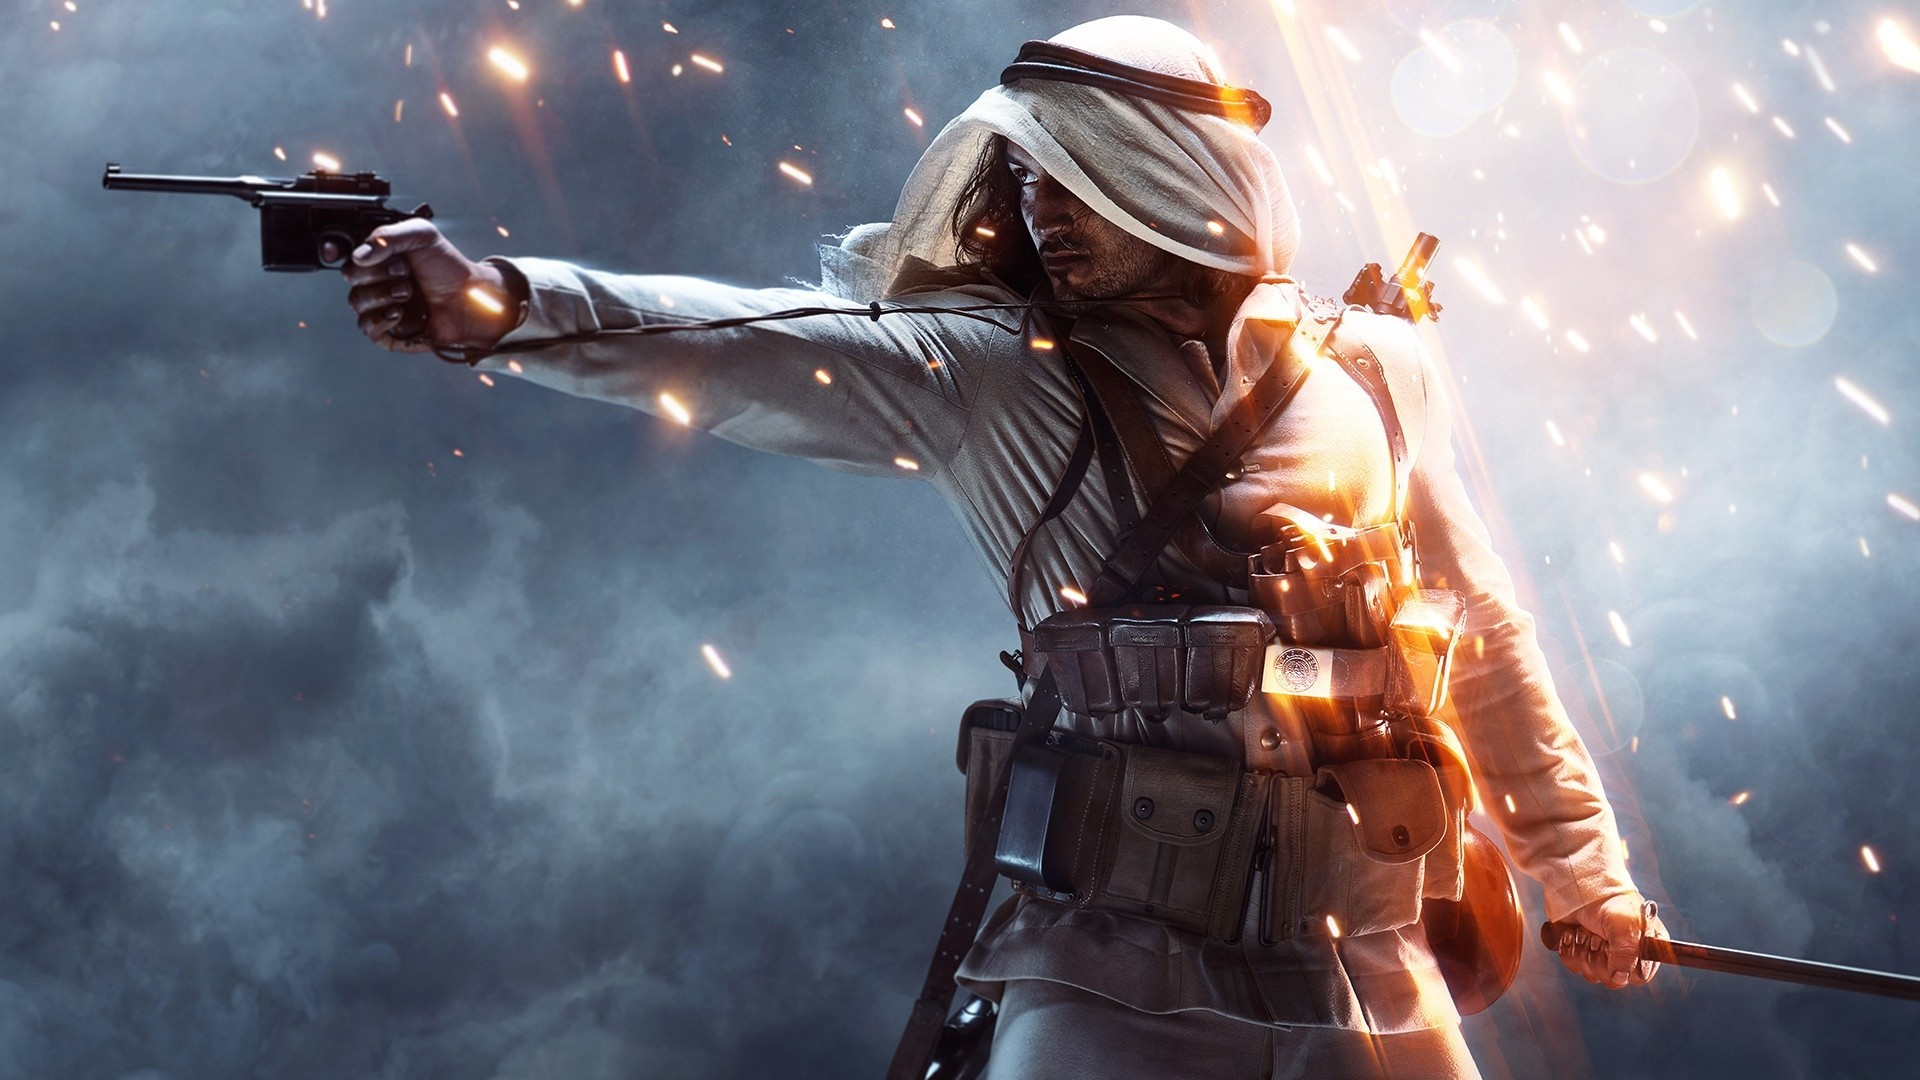 Battlefield 1 background wallpaper